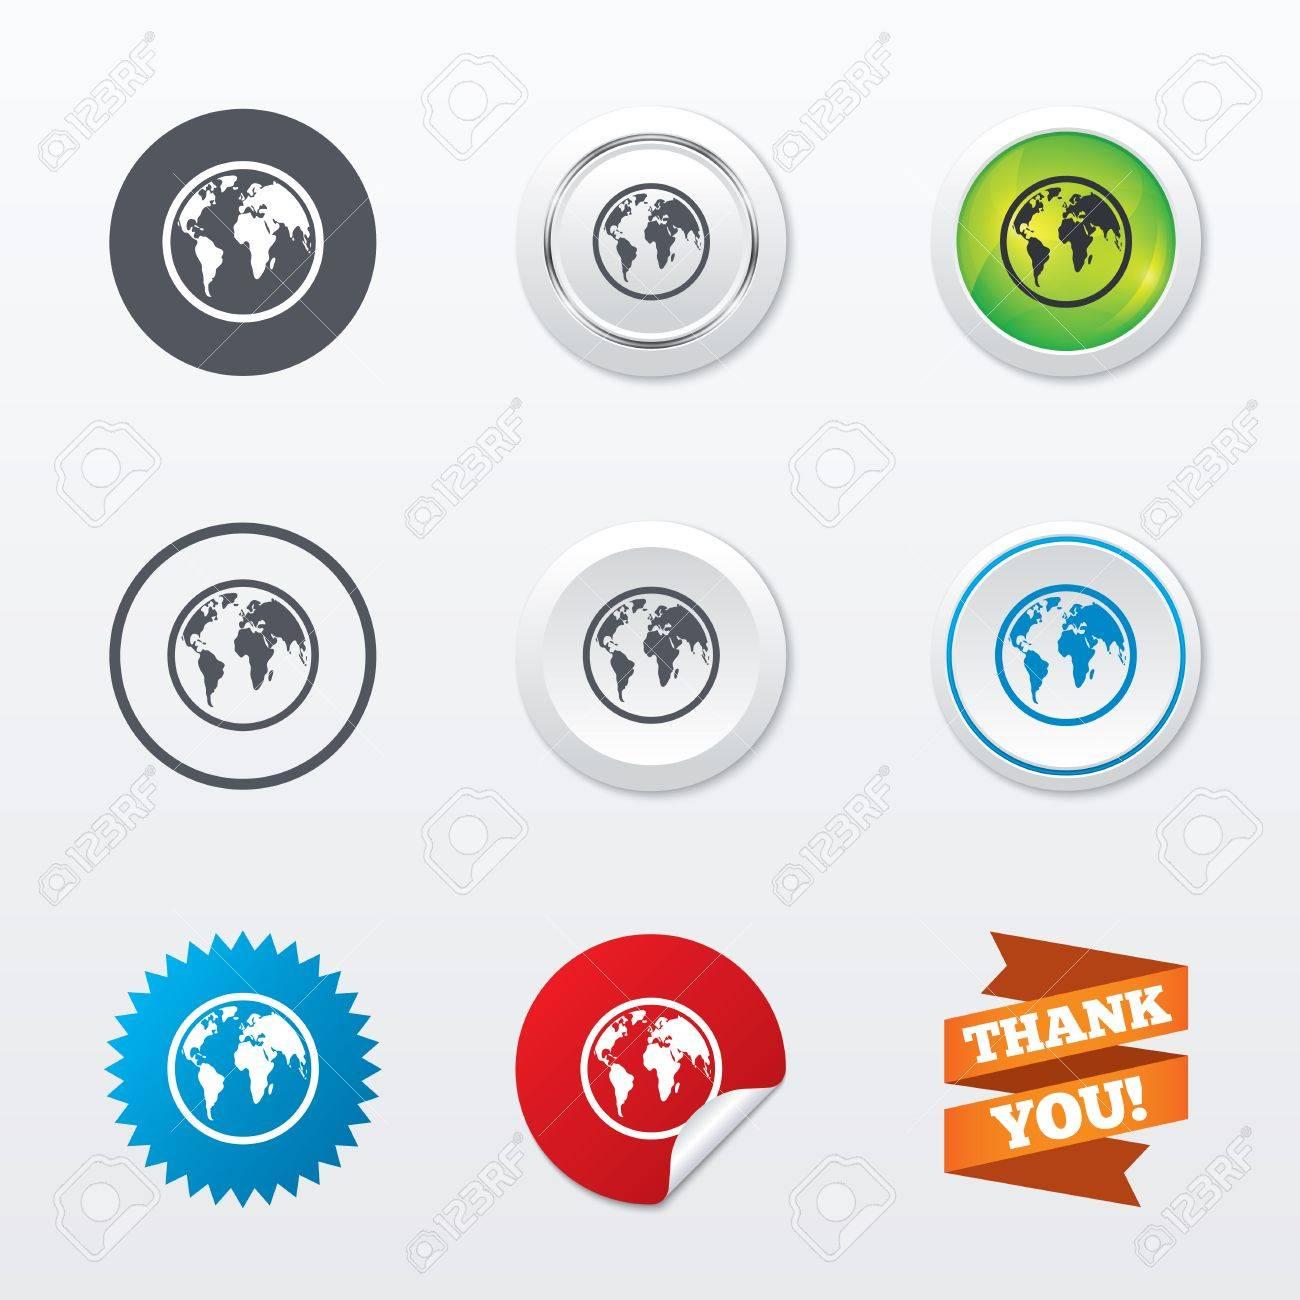 Globe sign icon world map geography symbol circle concept buttons vector globe sign icon world map geography symbol circle concept buttons metal edging gumiabroncs Choice Image